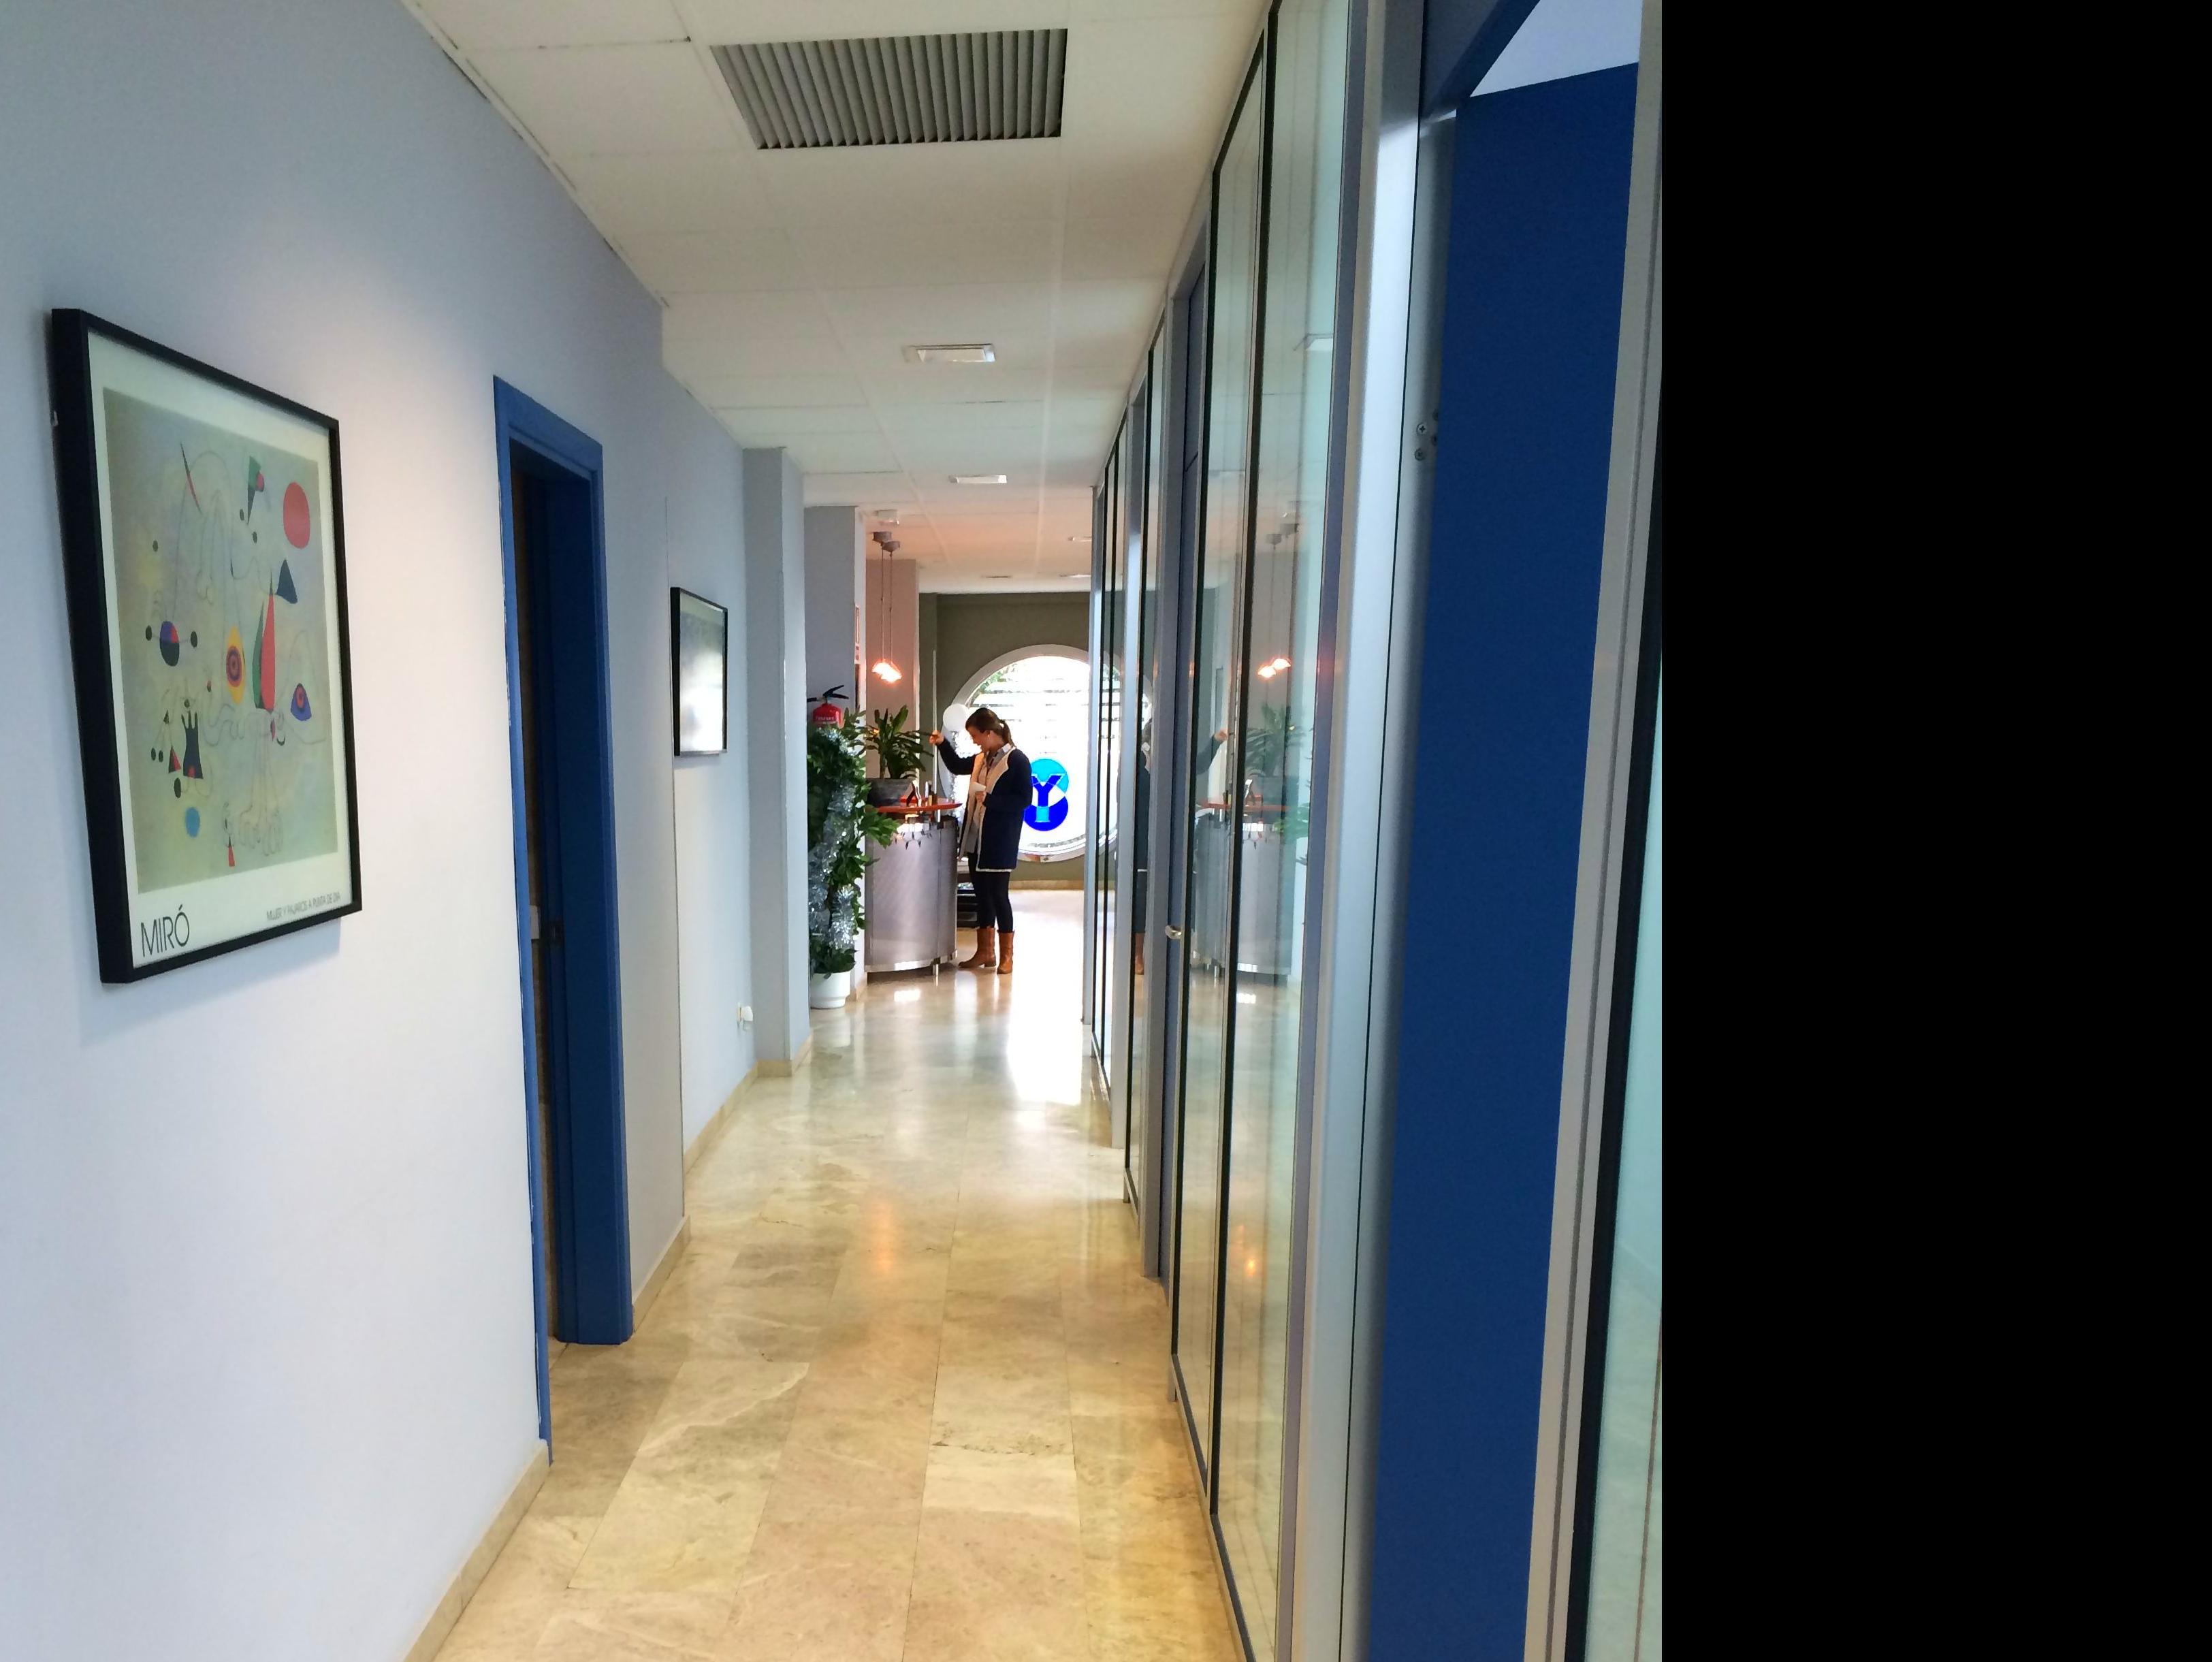 Foto 4 de Dentistas en Madrid | Clínica Dental Dr. Yagüe